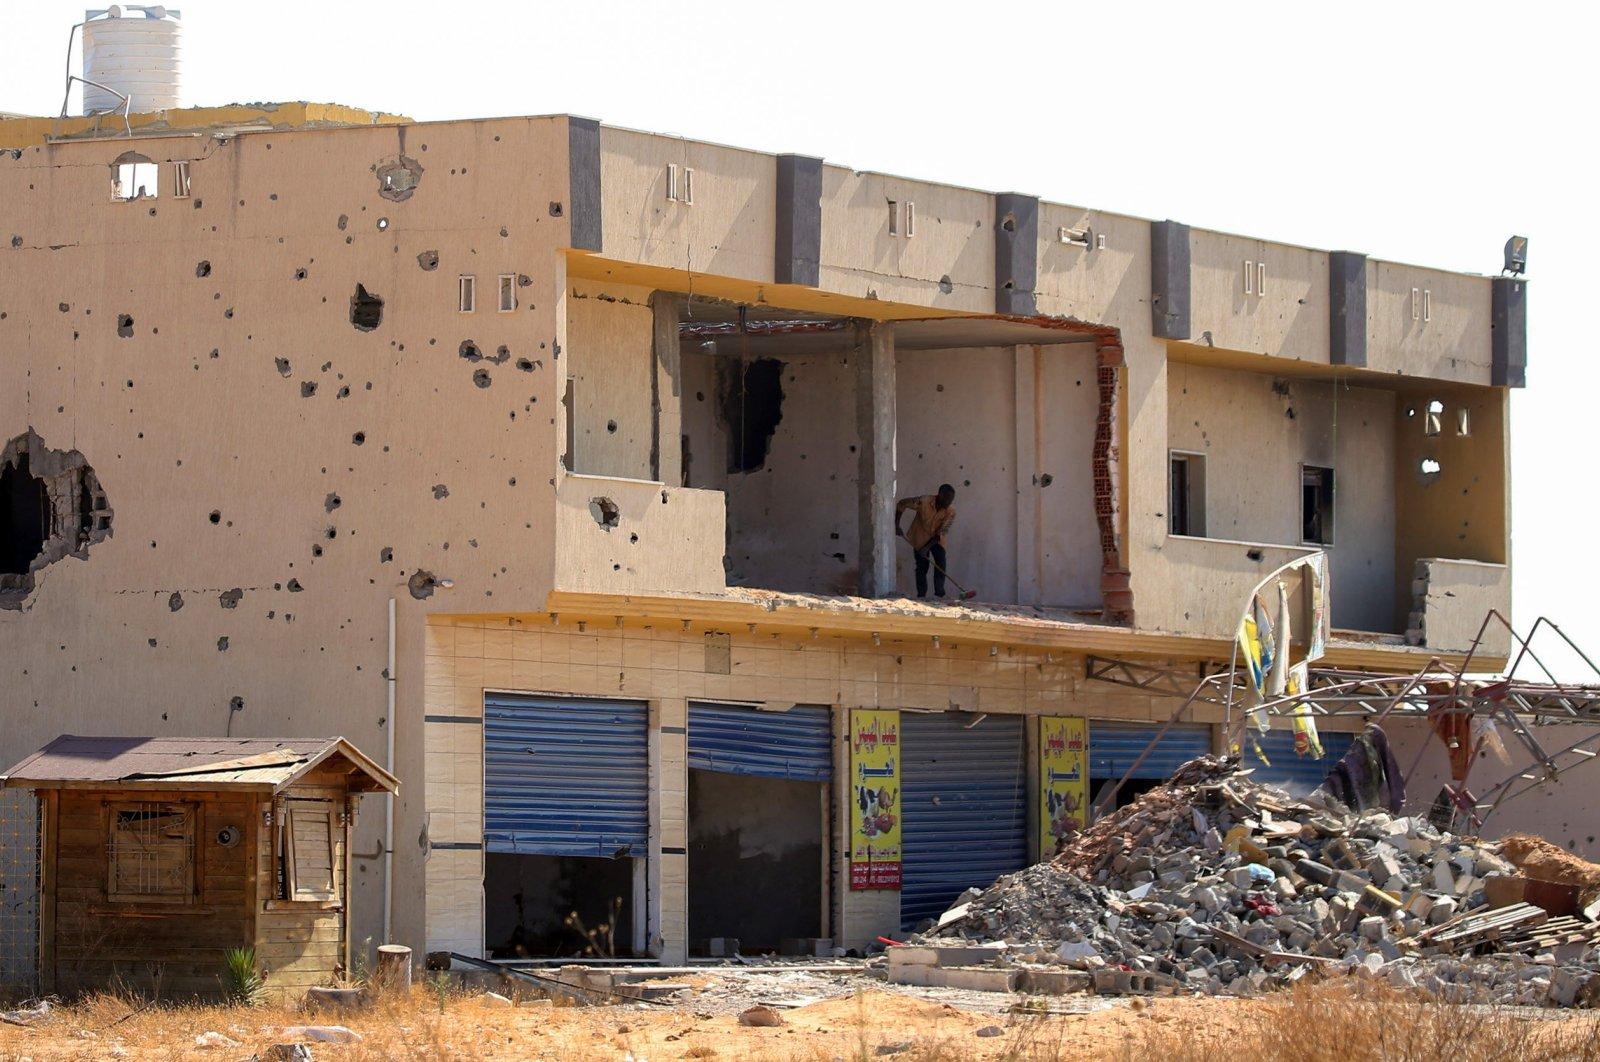 A building damaged during violence seen in Tripoli, Libya, July 9, 2020. (AFP Photo)